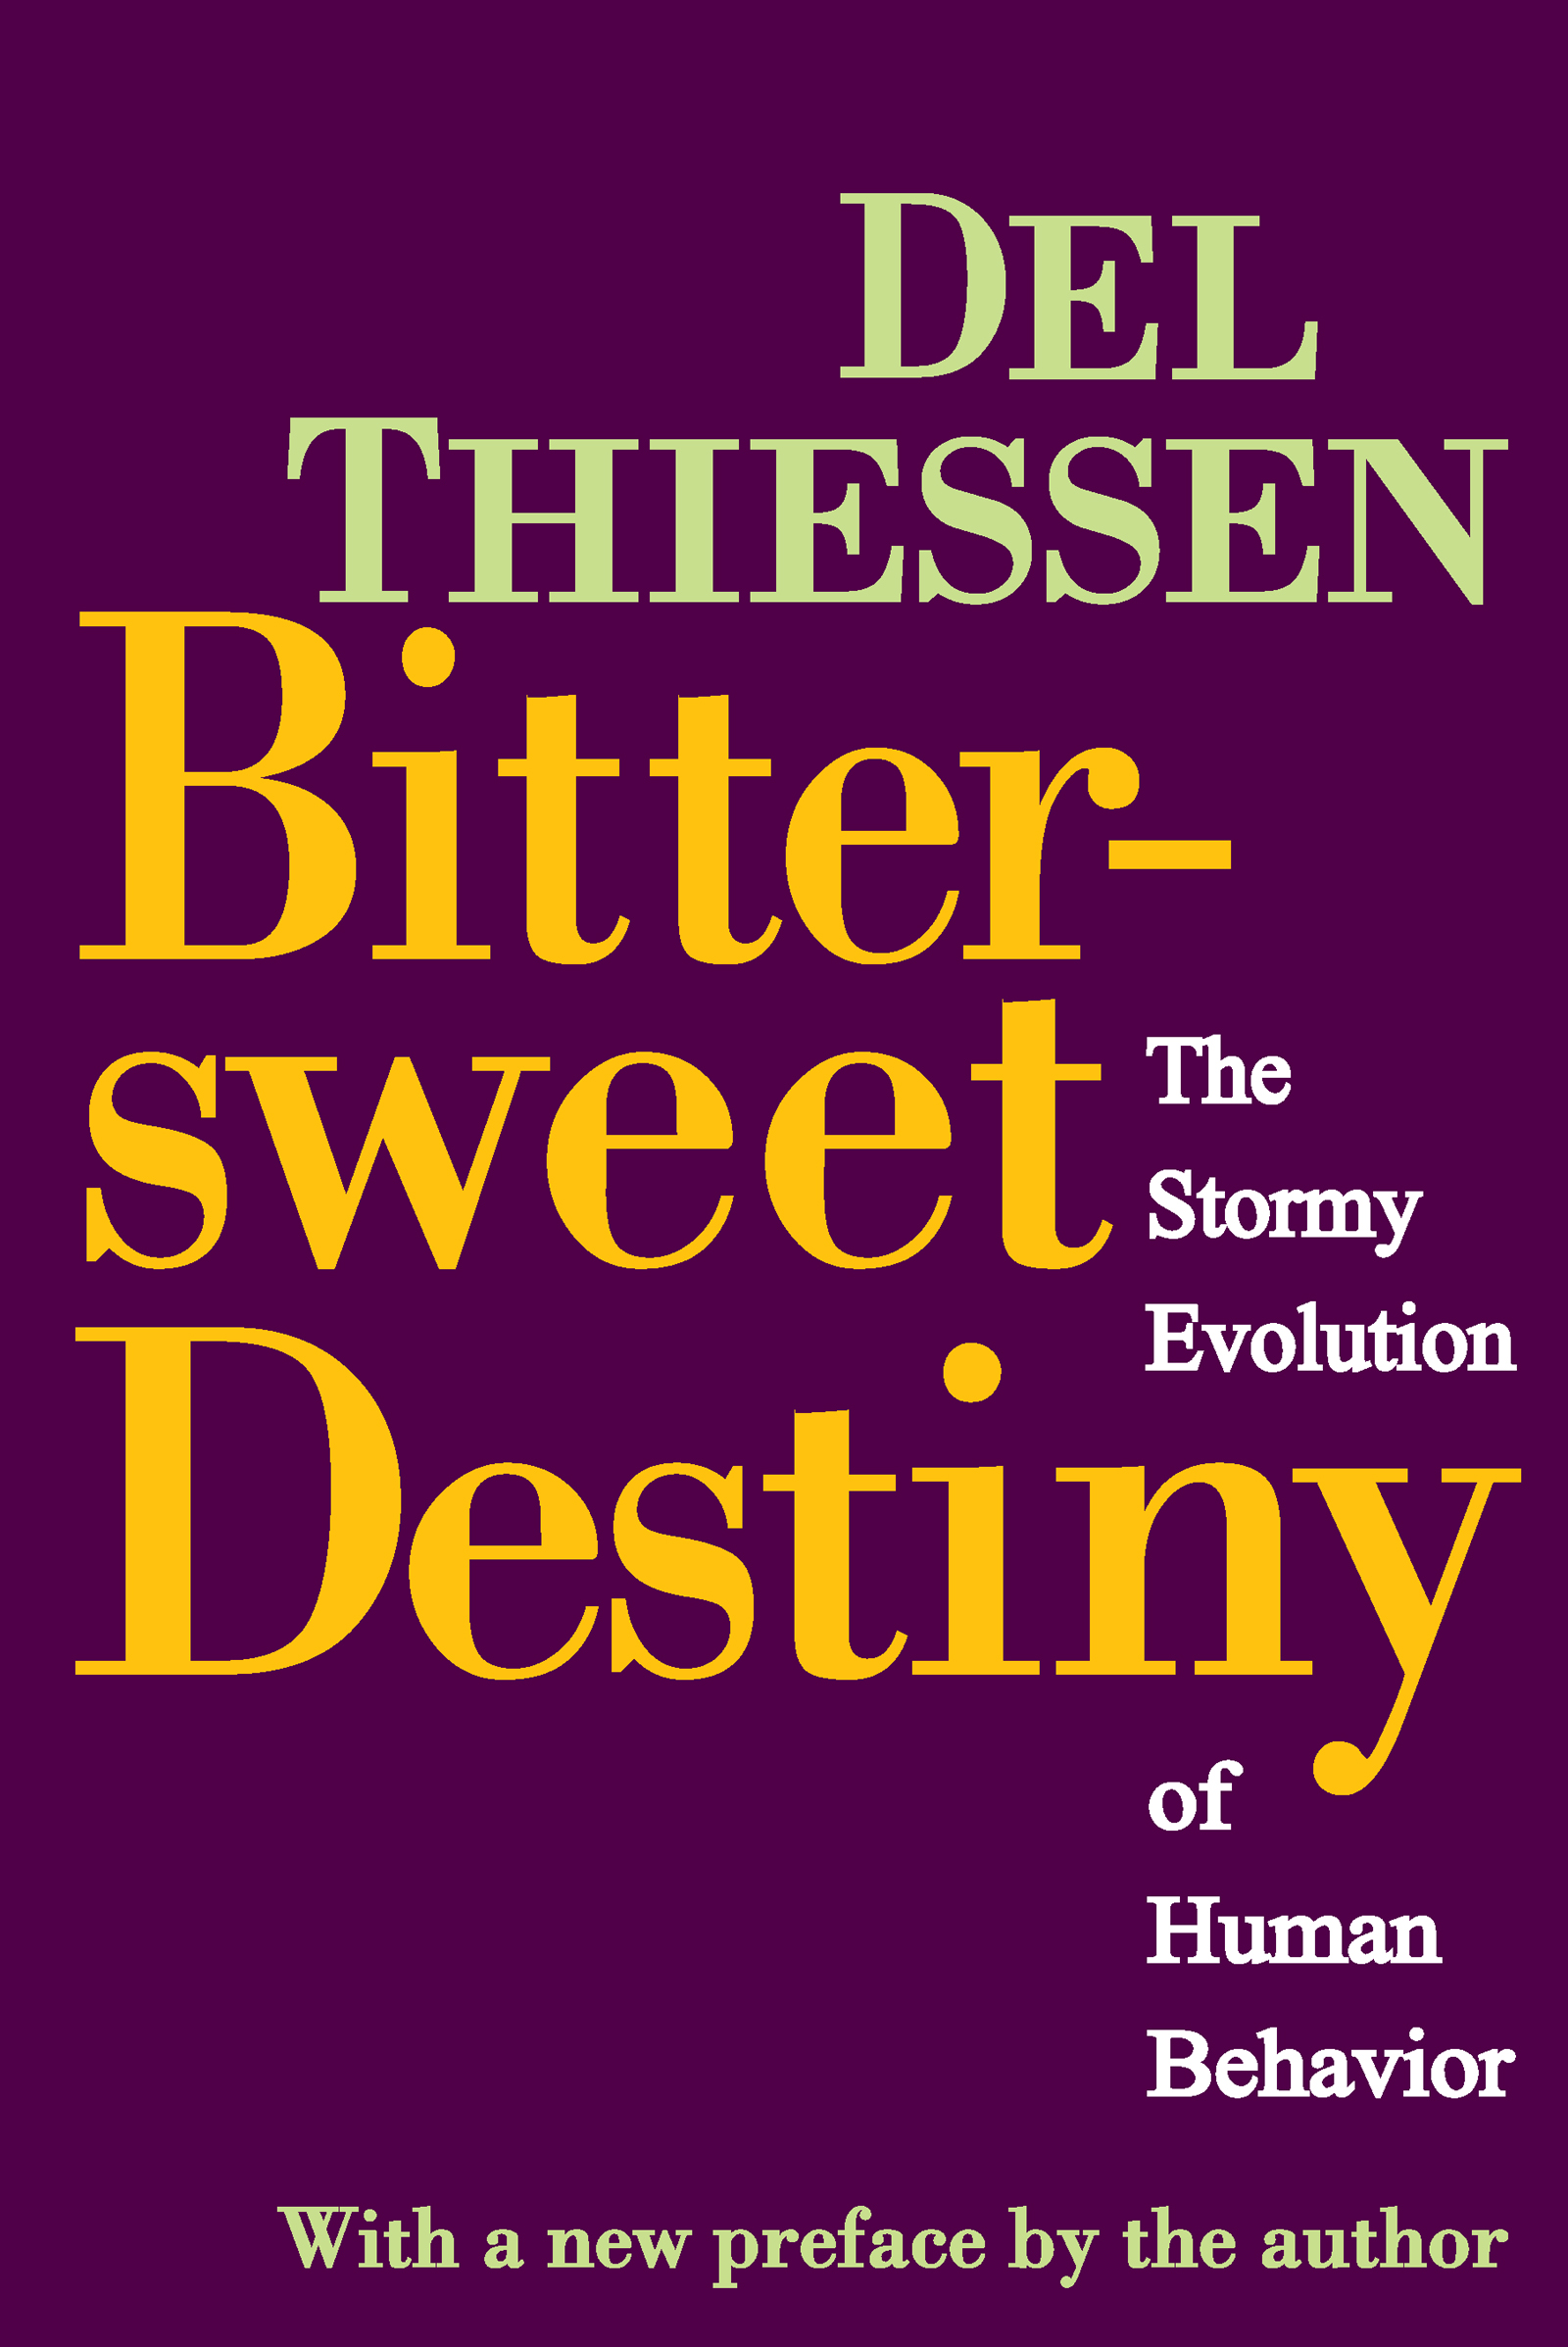 Bittersweet Destiny